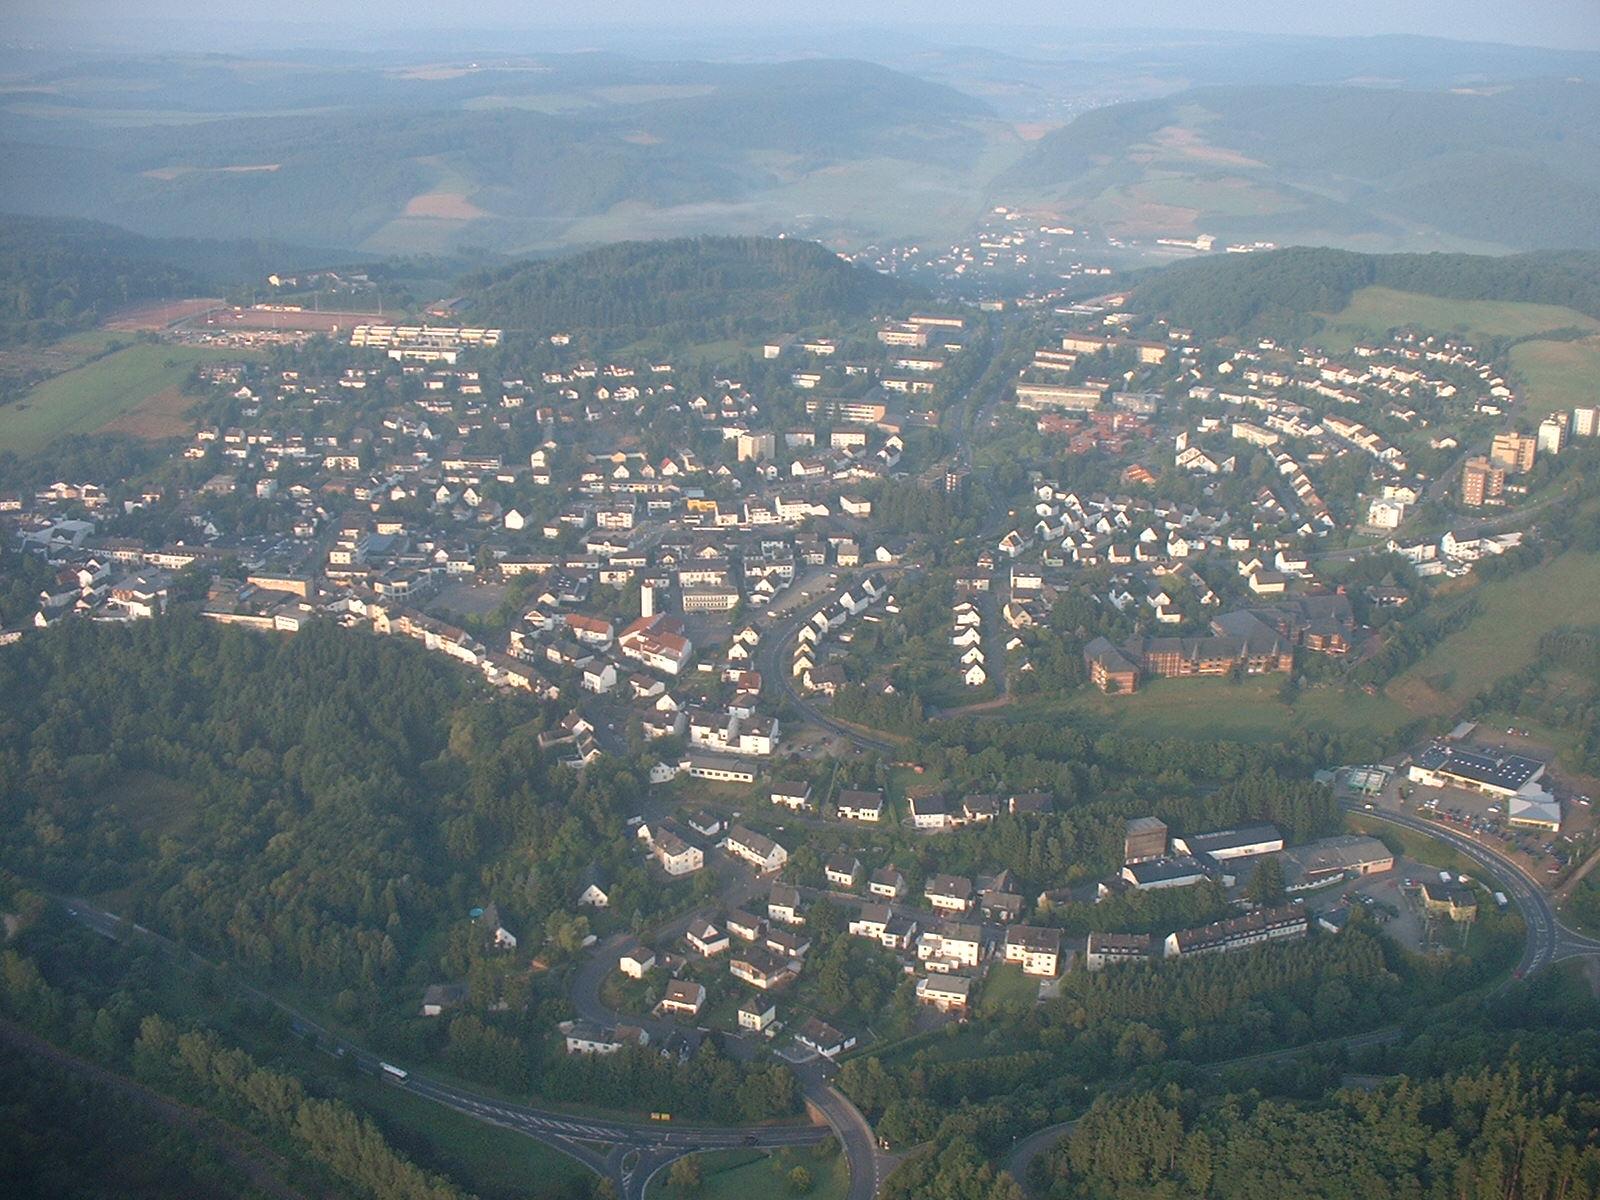 Daun Germany  city images : Datei:Daun luftbild – Wikipedia